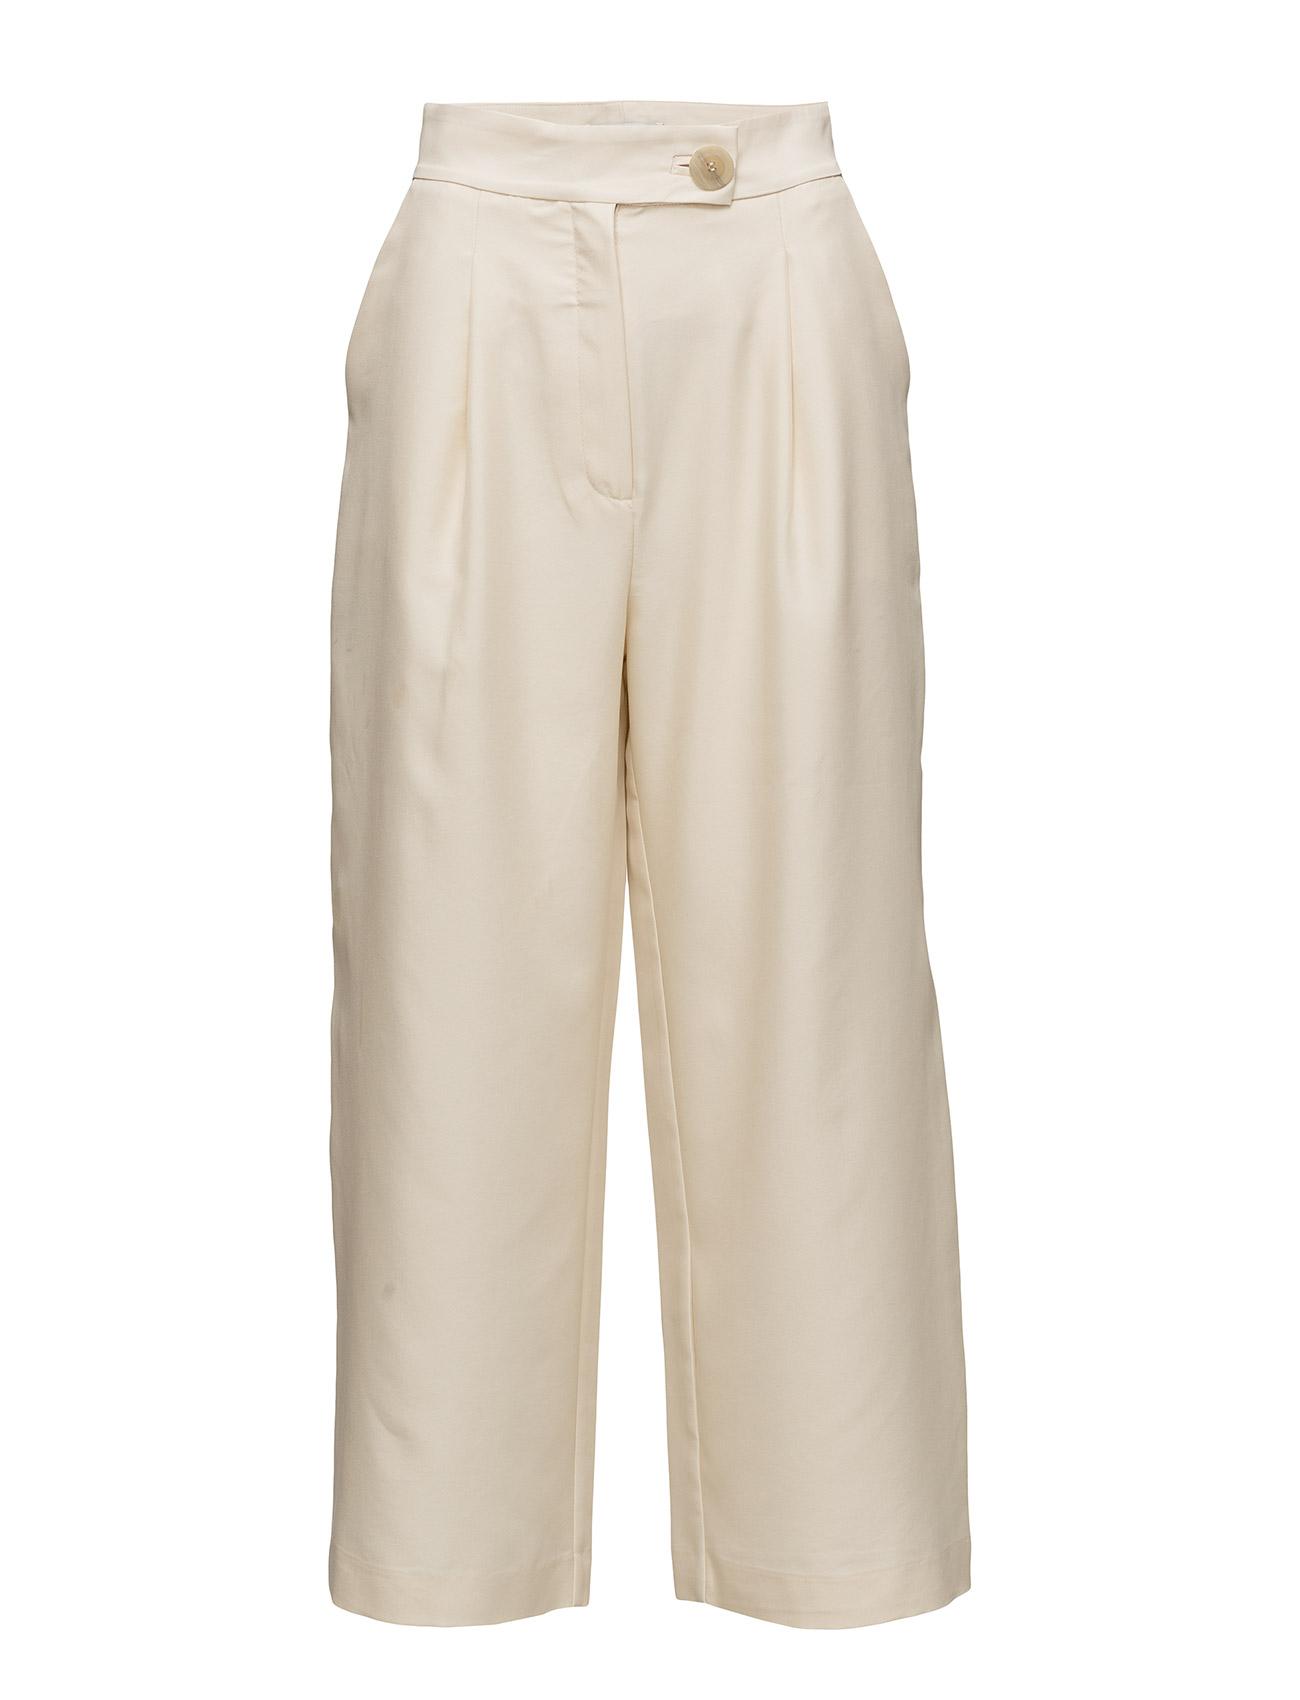 Mango Pleat detail trousers